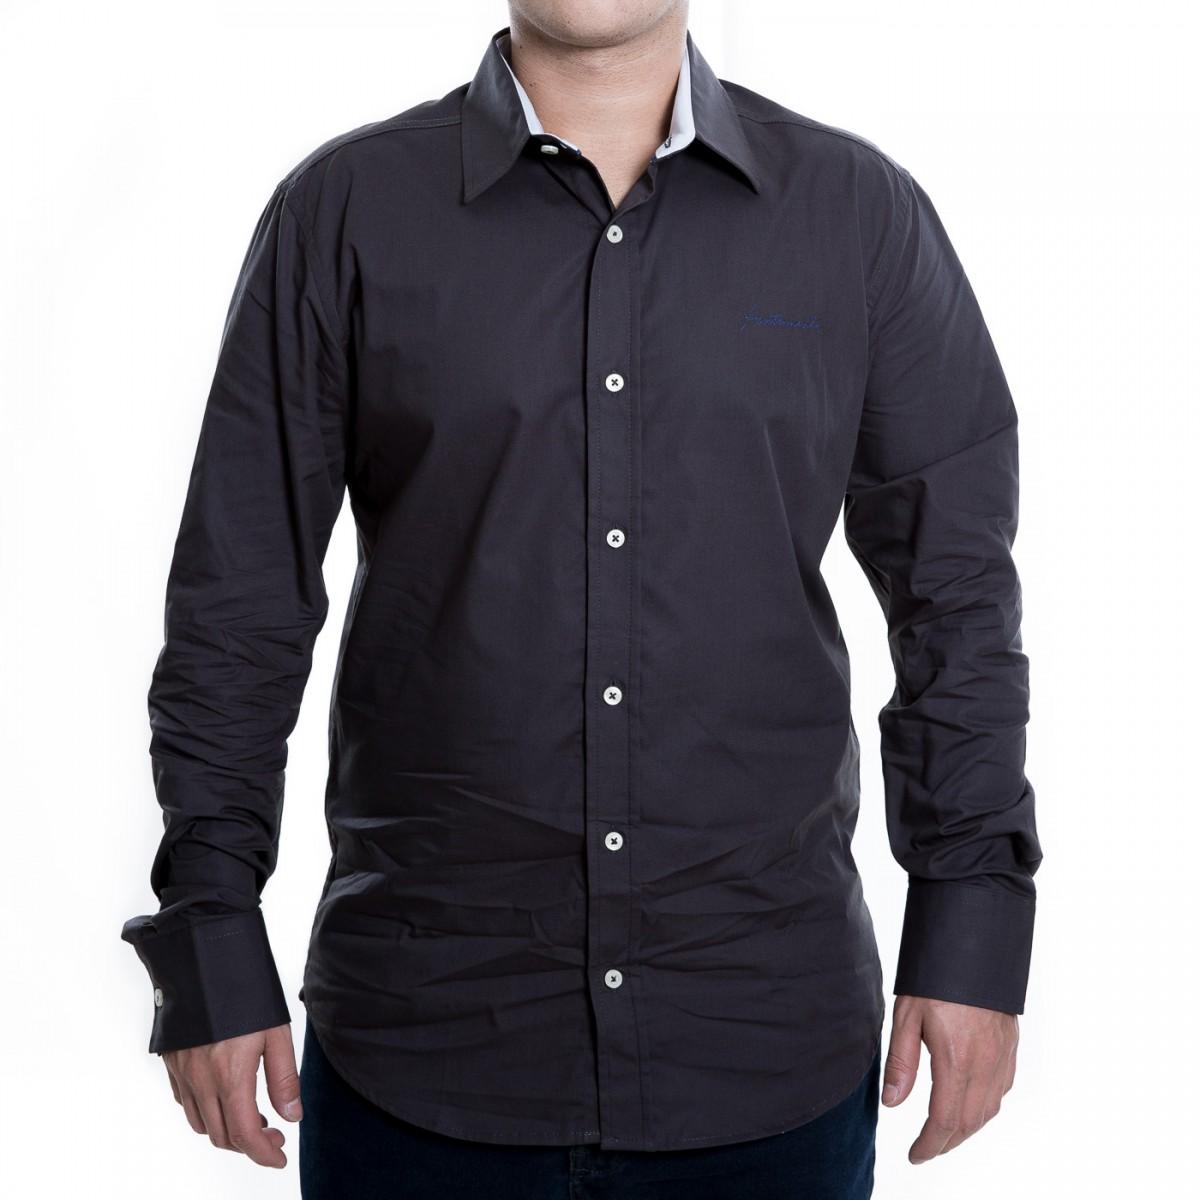 7edf726853 Bizz Store - Camisa Social Masculina Acostamento Manga Longa Branco